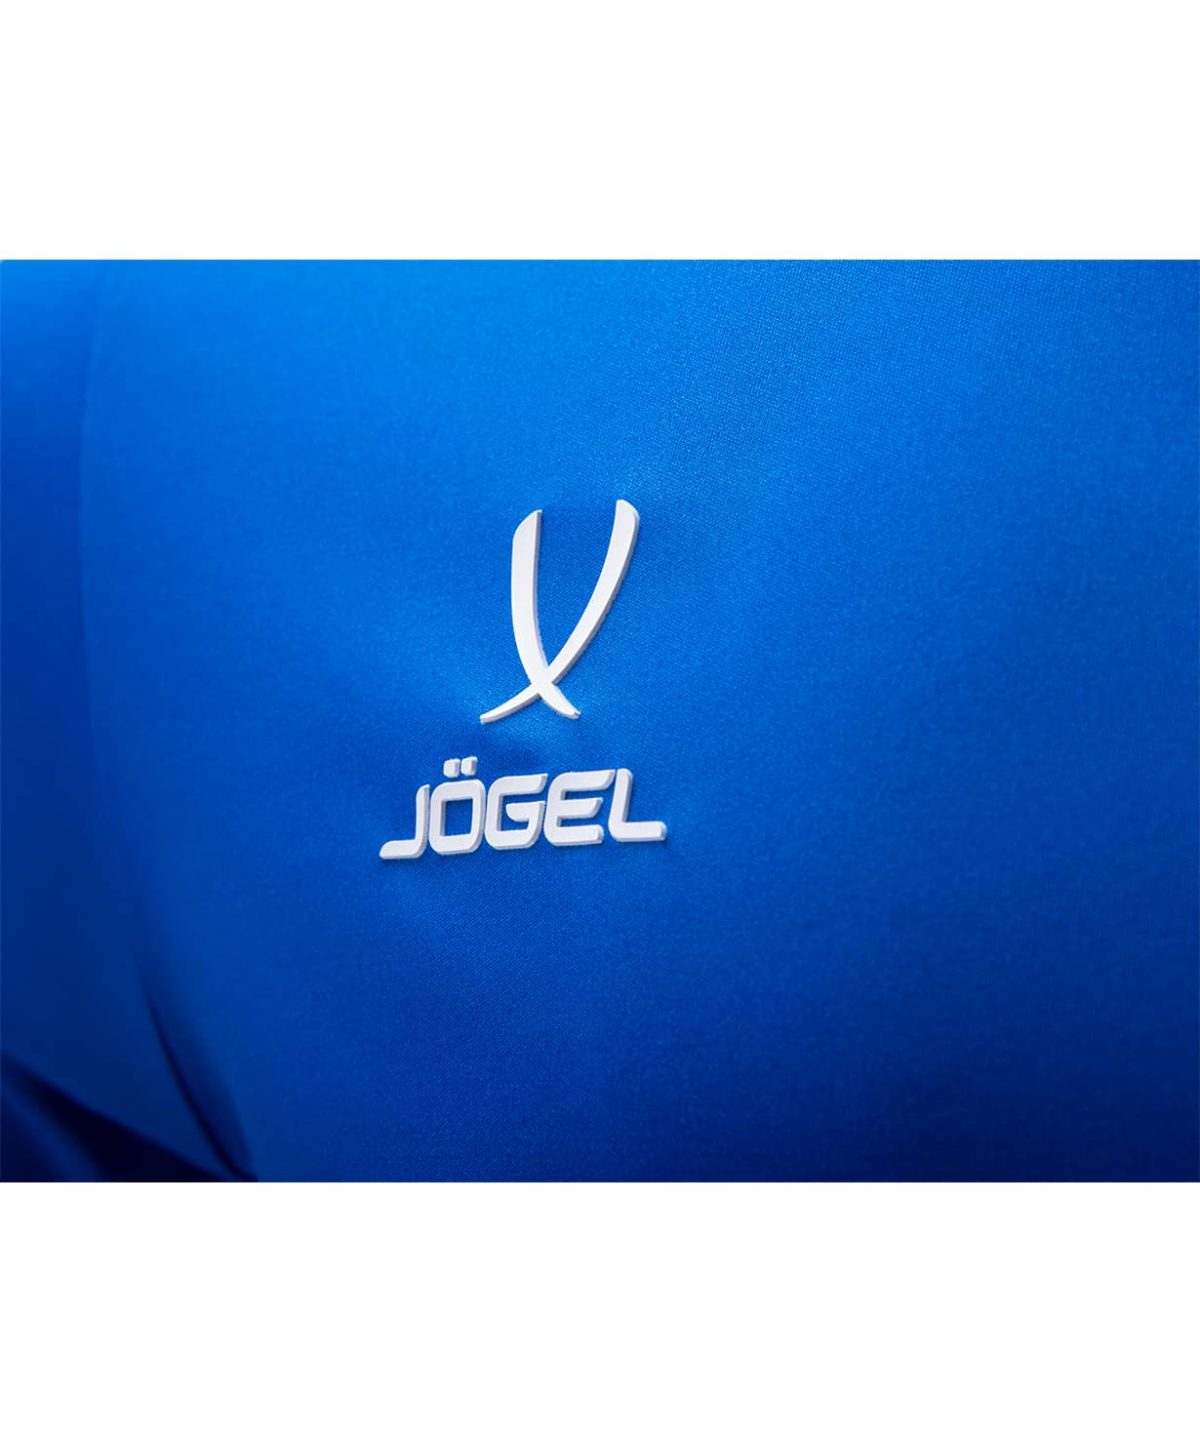 JOGEL DIVISION шорты футбольные  Union Shorts - 4